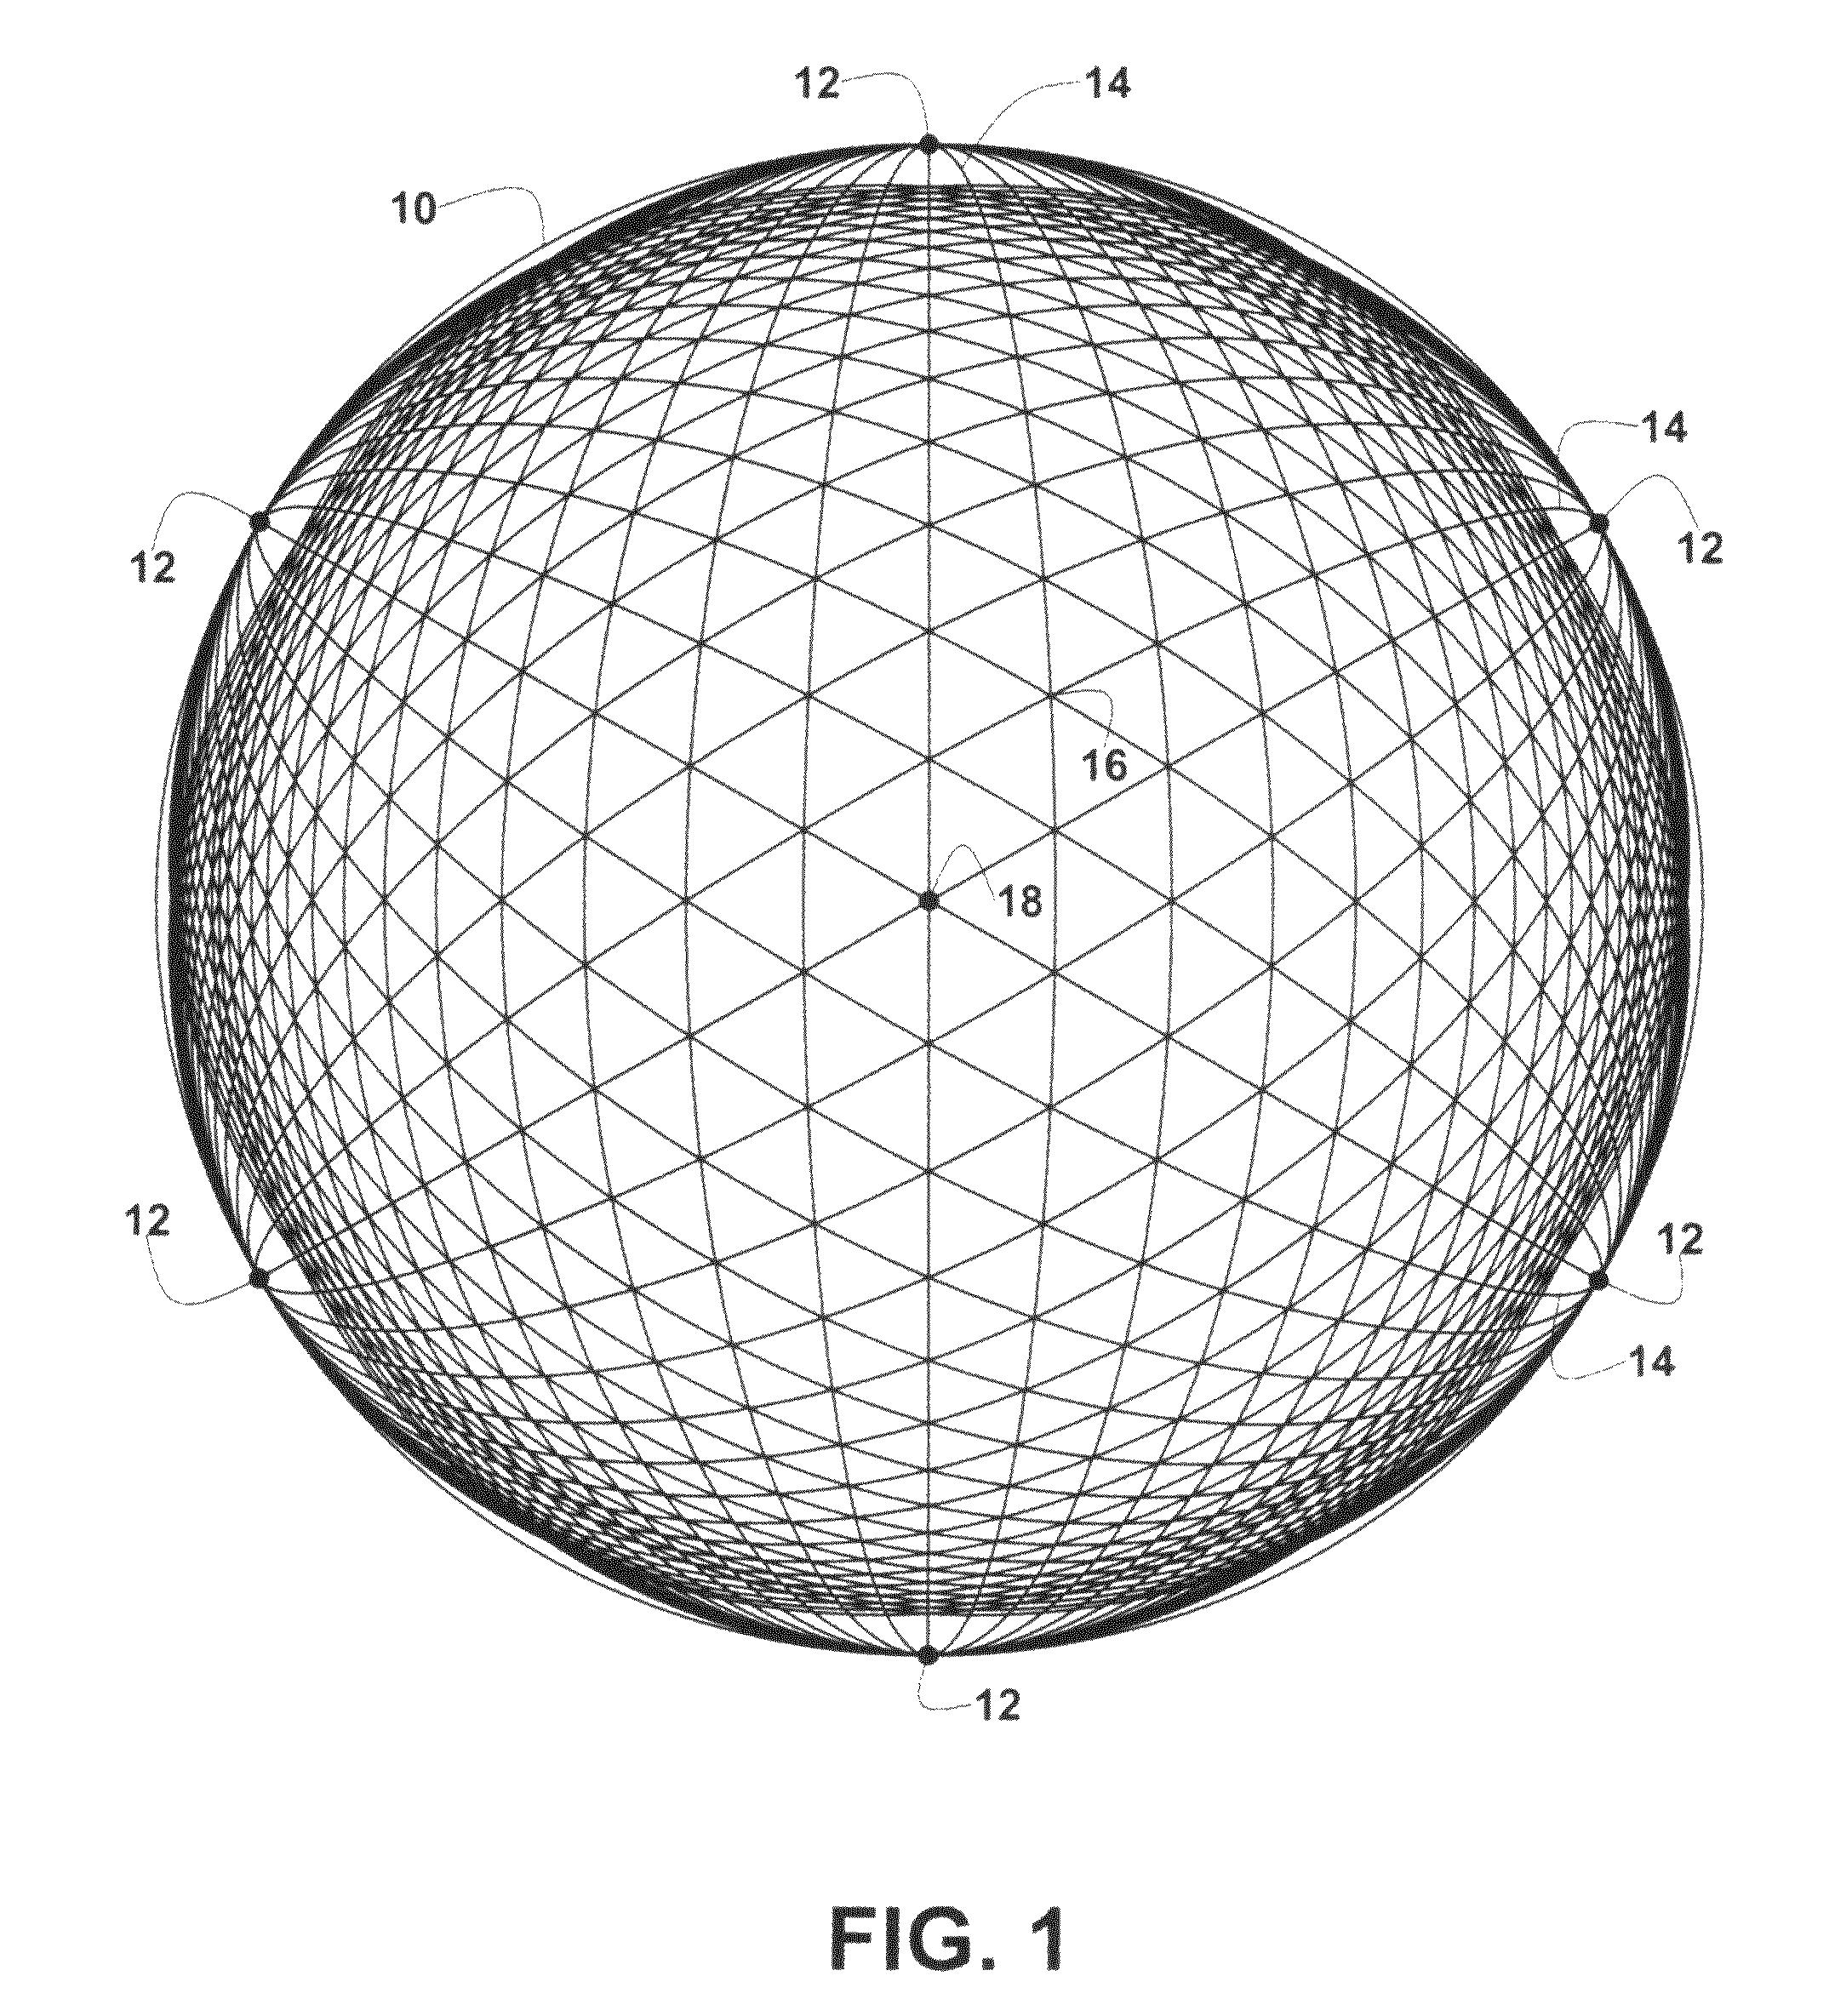 Drawn spheric polygonal Spherical Patent dome Google Patents